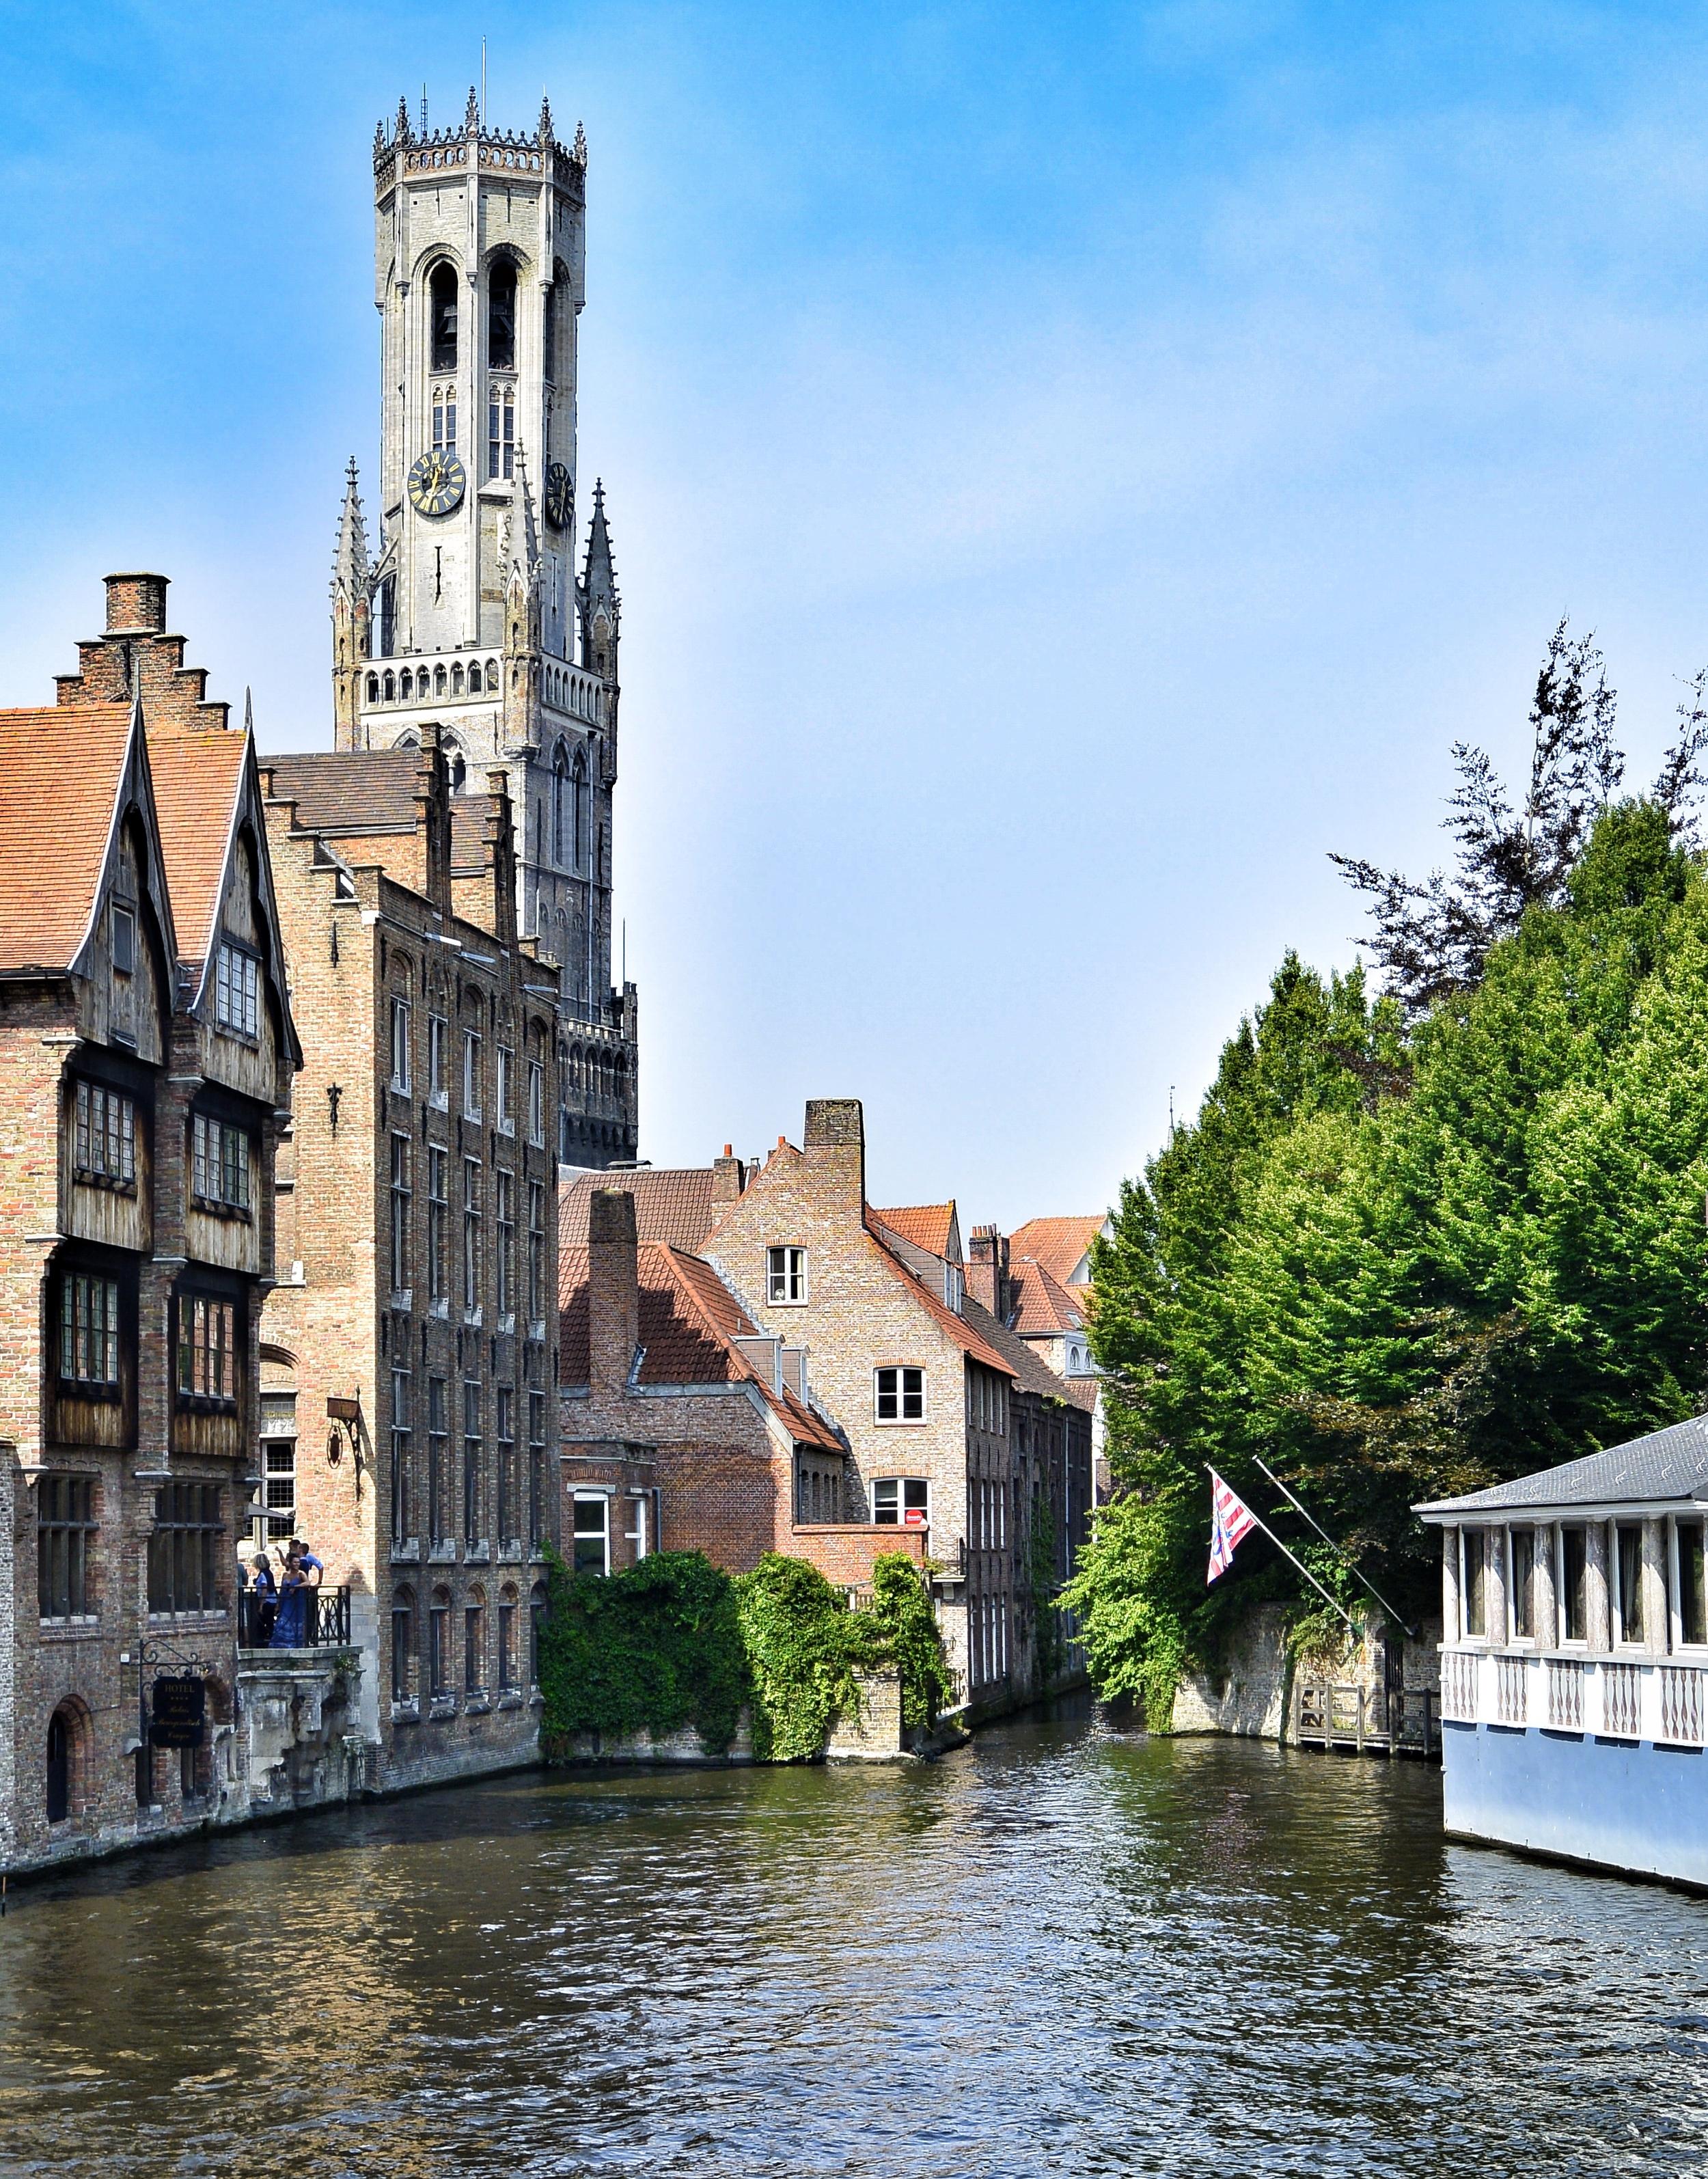 Rozenhoedkaai and Belfort Tower in Bruges